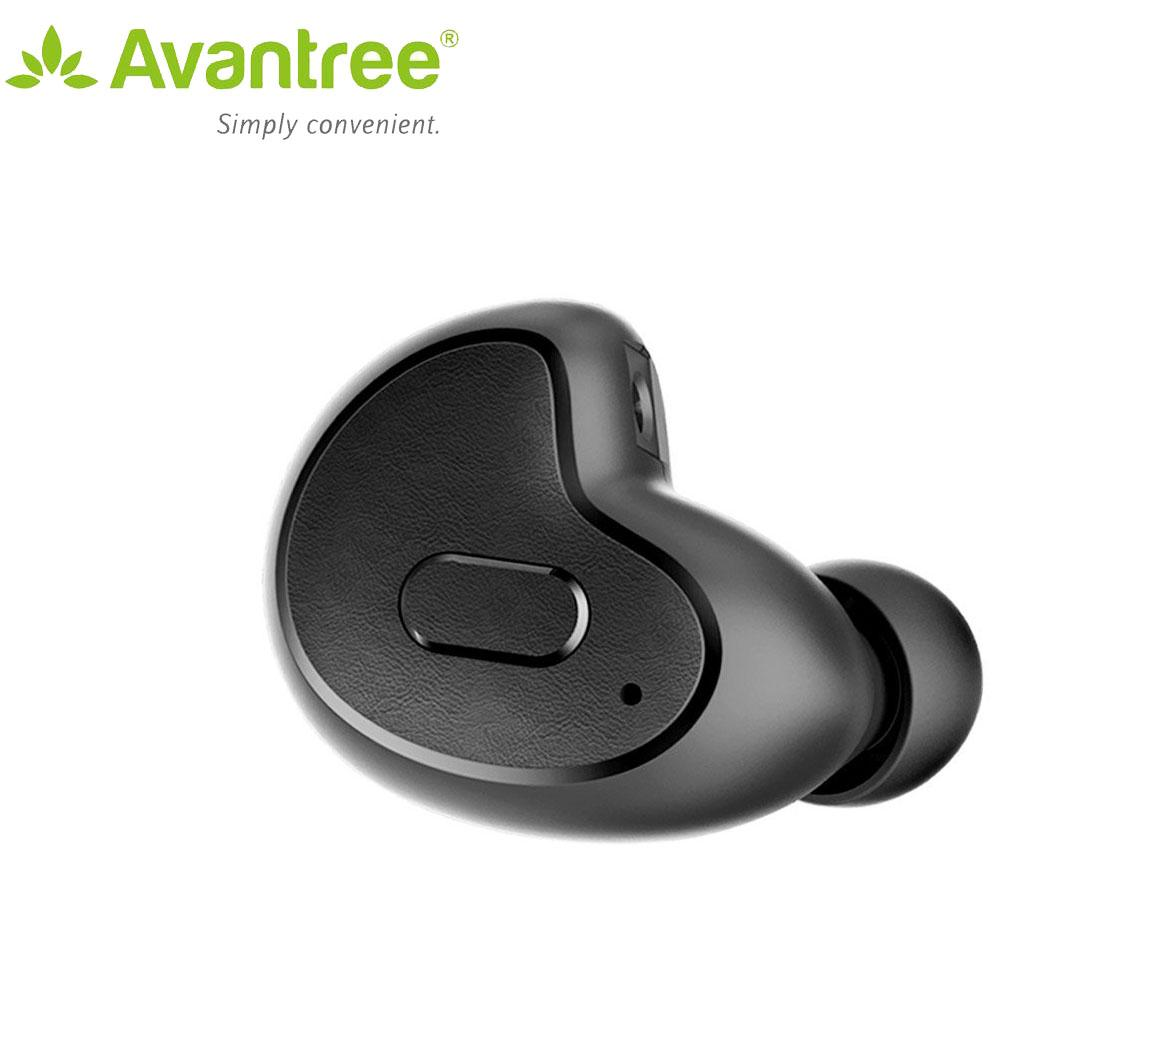 Bán Mua Trực Tuyến Tai Nghe Khong Day Bluetooth 4 1 Nhỏ Gọn Avantree Apico Bths Ah8M A1859 Mau Đen